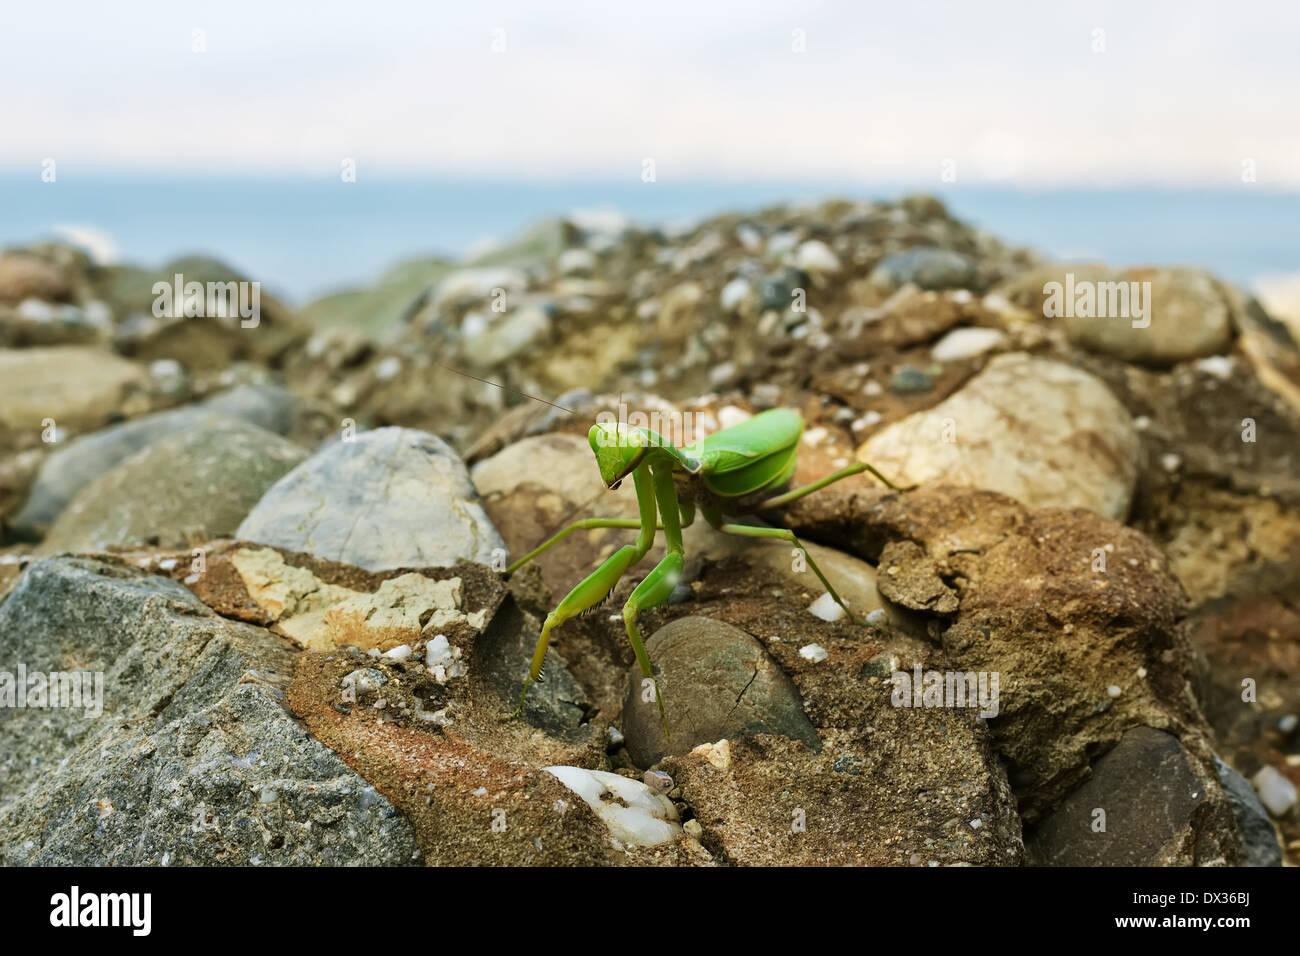 Closeup image of green praying mantis (Mantis religiosa) is sitting on the rock near sea, front view Stock Photo